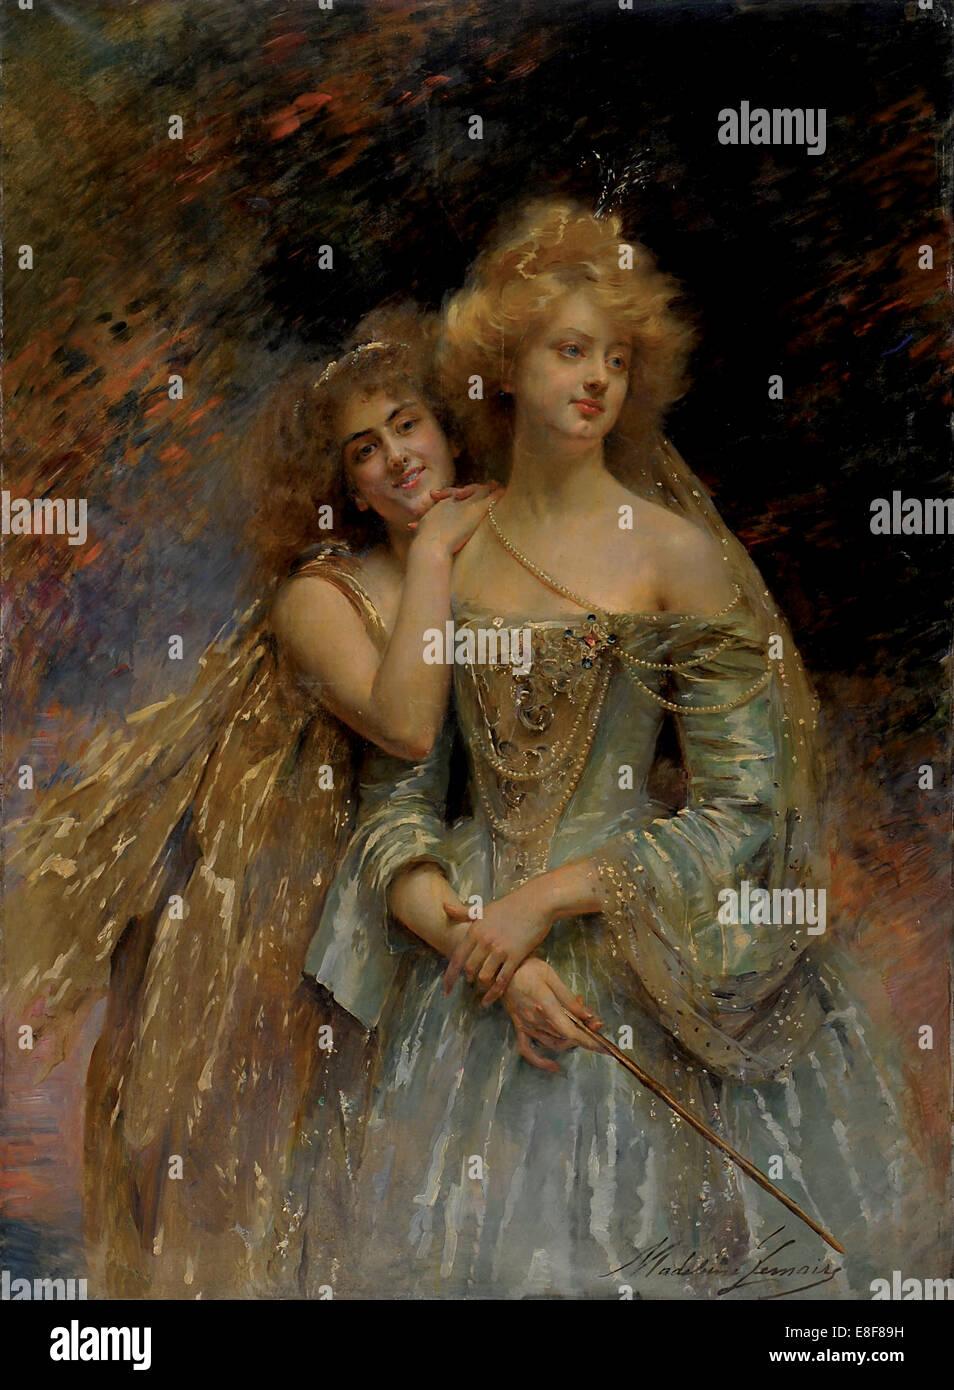 The fairies. Artist: Lemaire, Madeleine Jeanne (1845-1928) - Stock Image